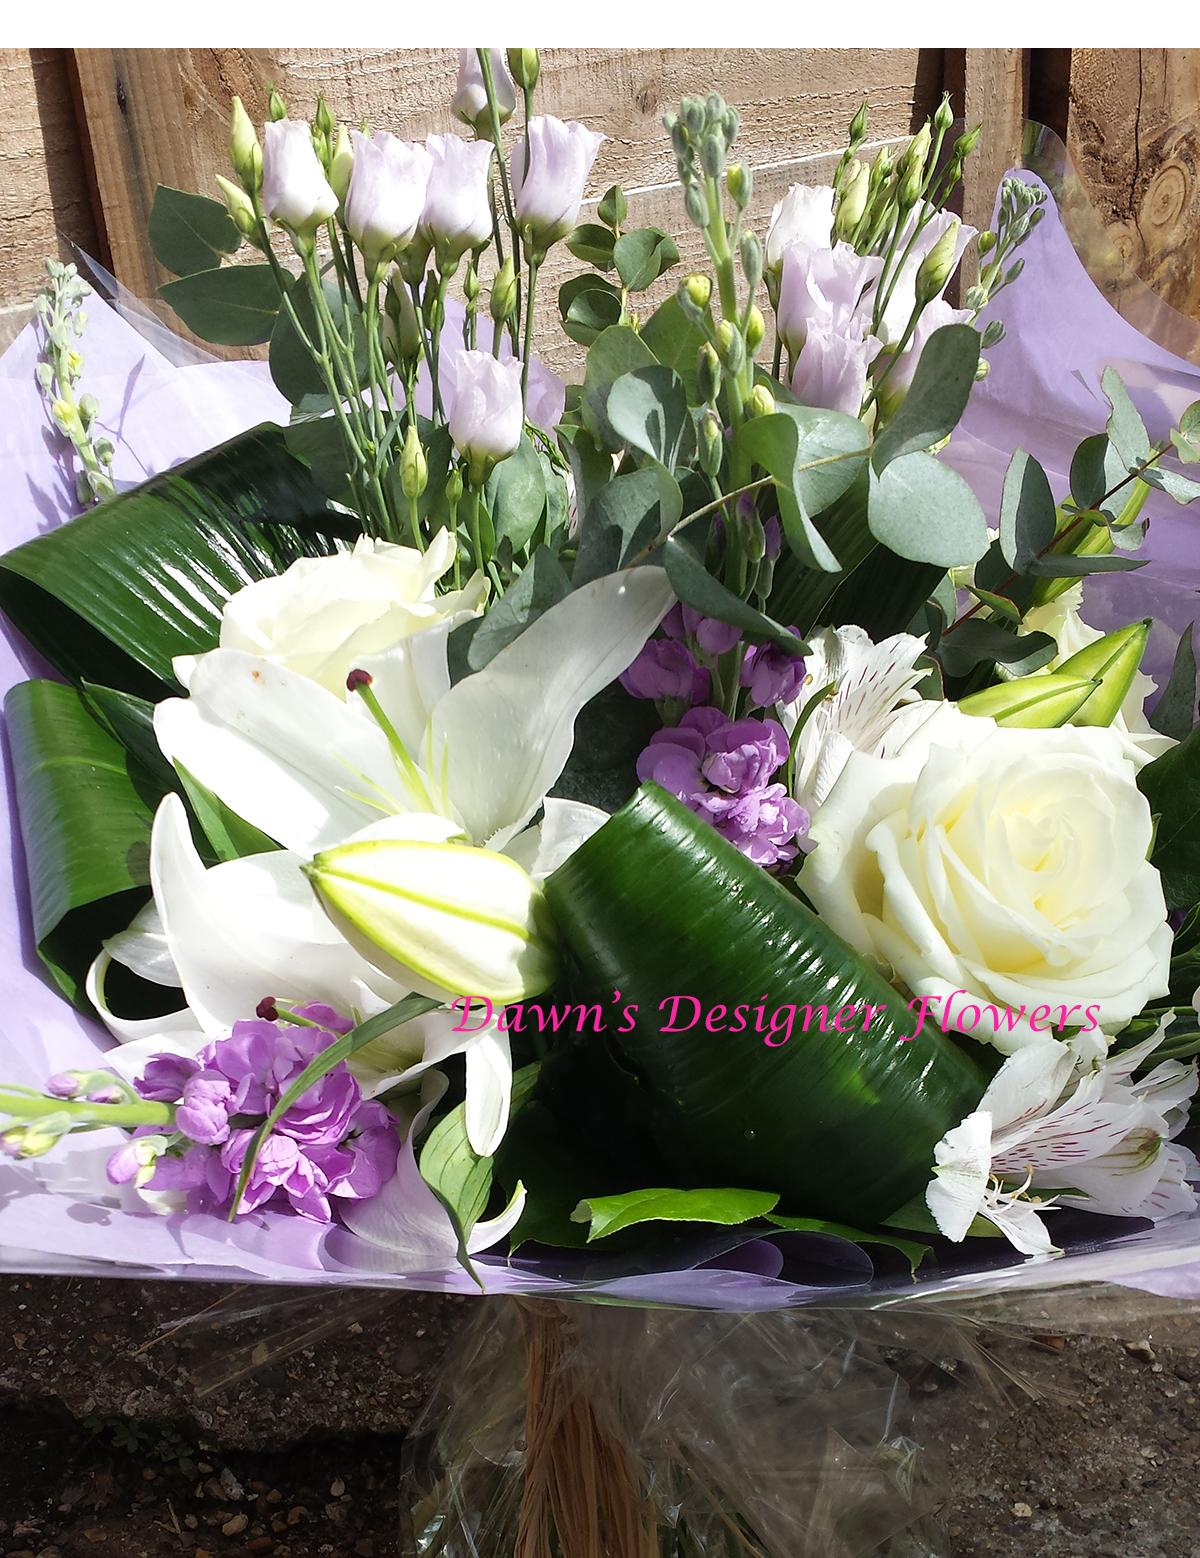 Flower Bouquet-London Florist / Dawns Designer Flowers